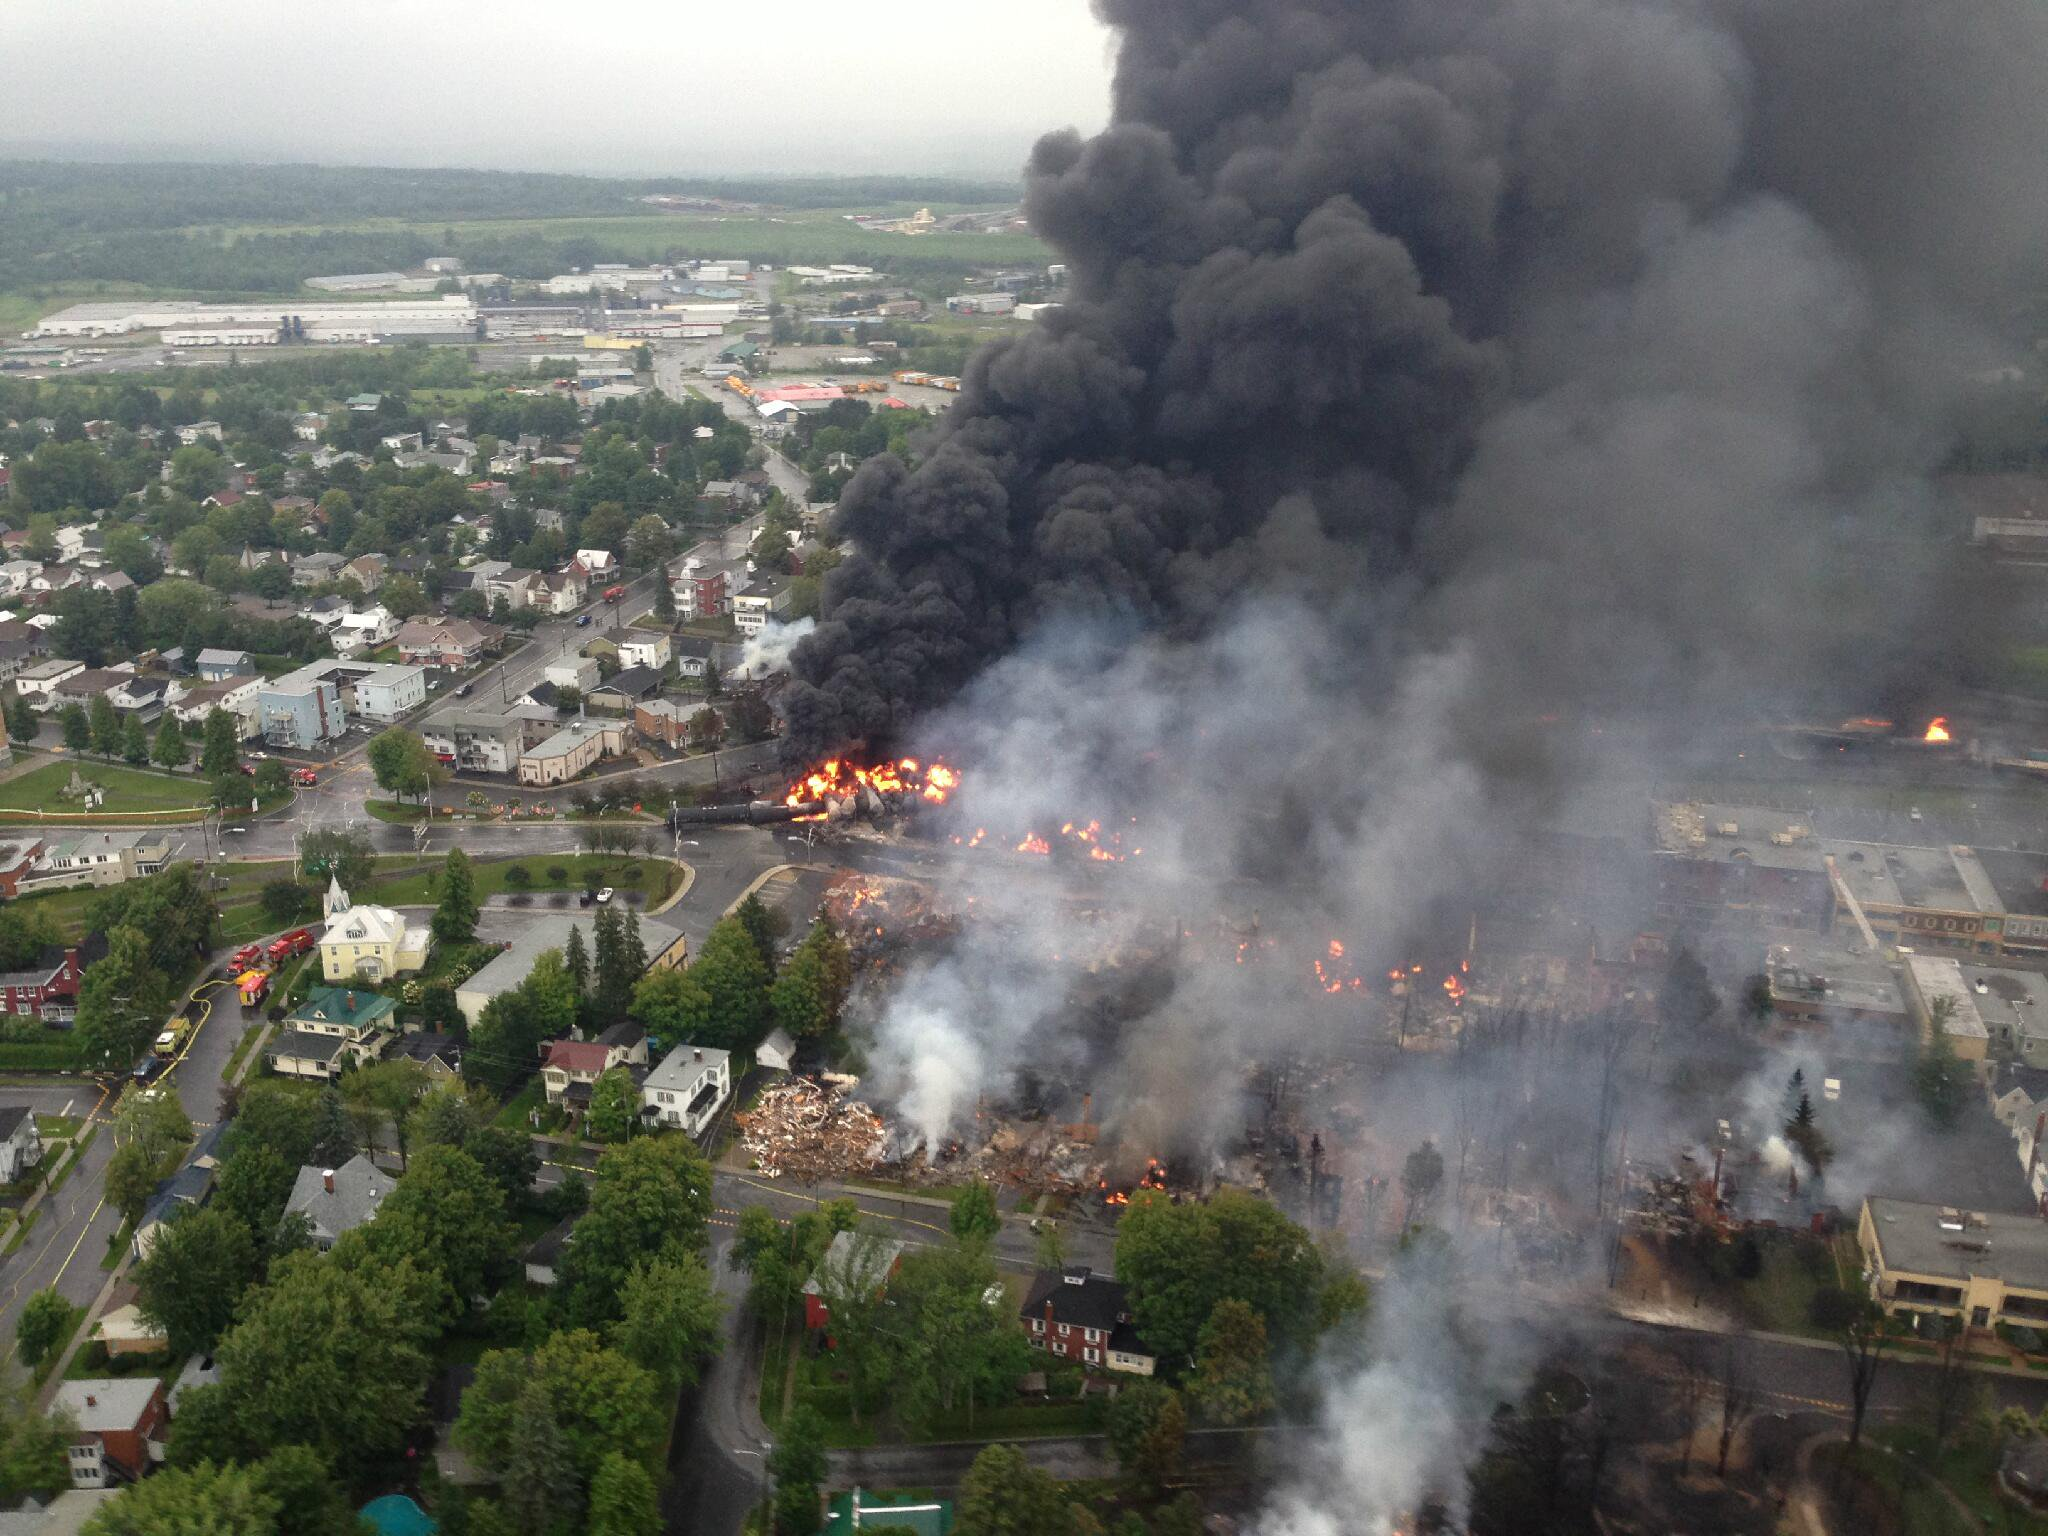 Aftermath of Lac-Megantic train explosion